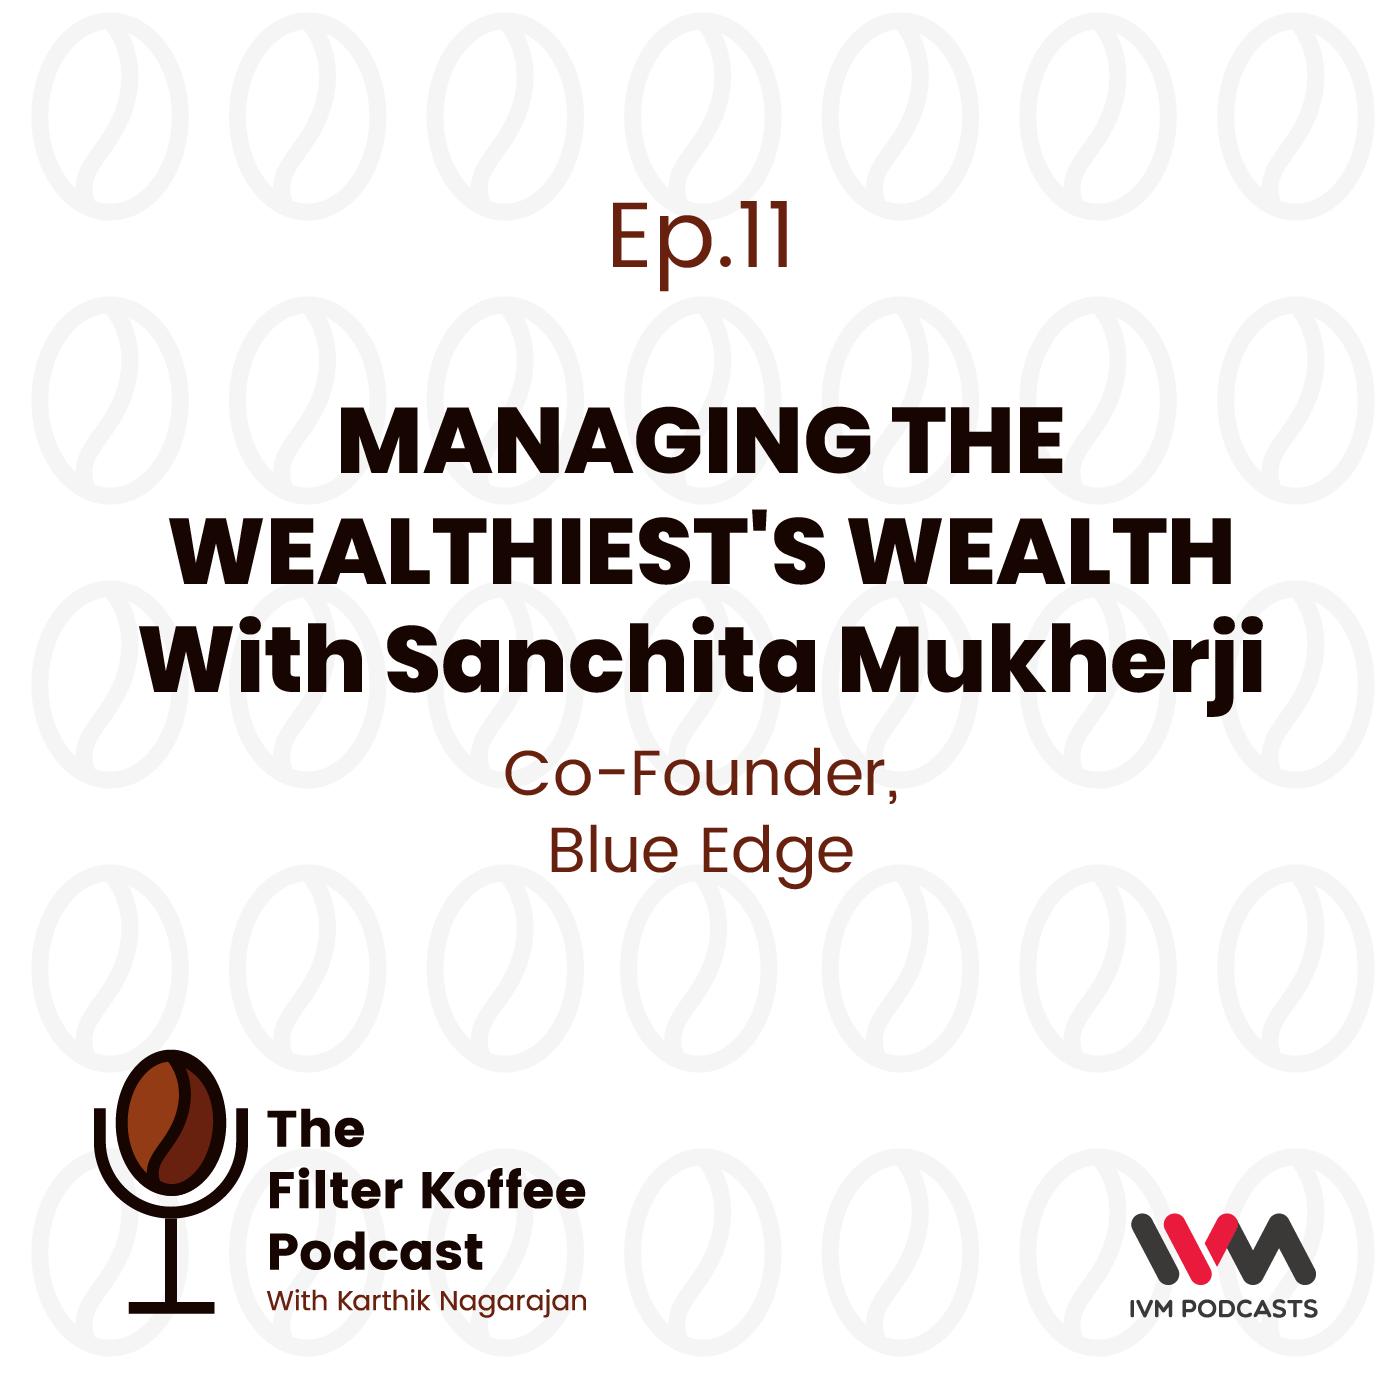 Ep. 11: Managing the Wealthiest's Wealth with Sanchita Mukherji